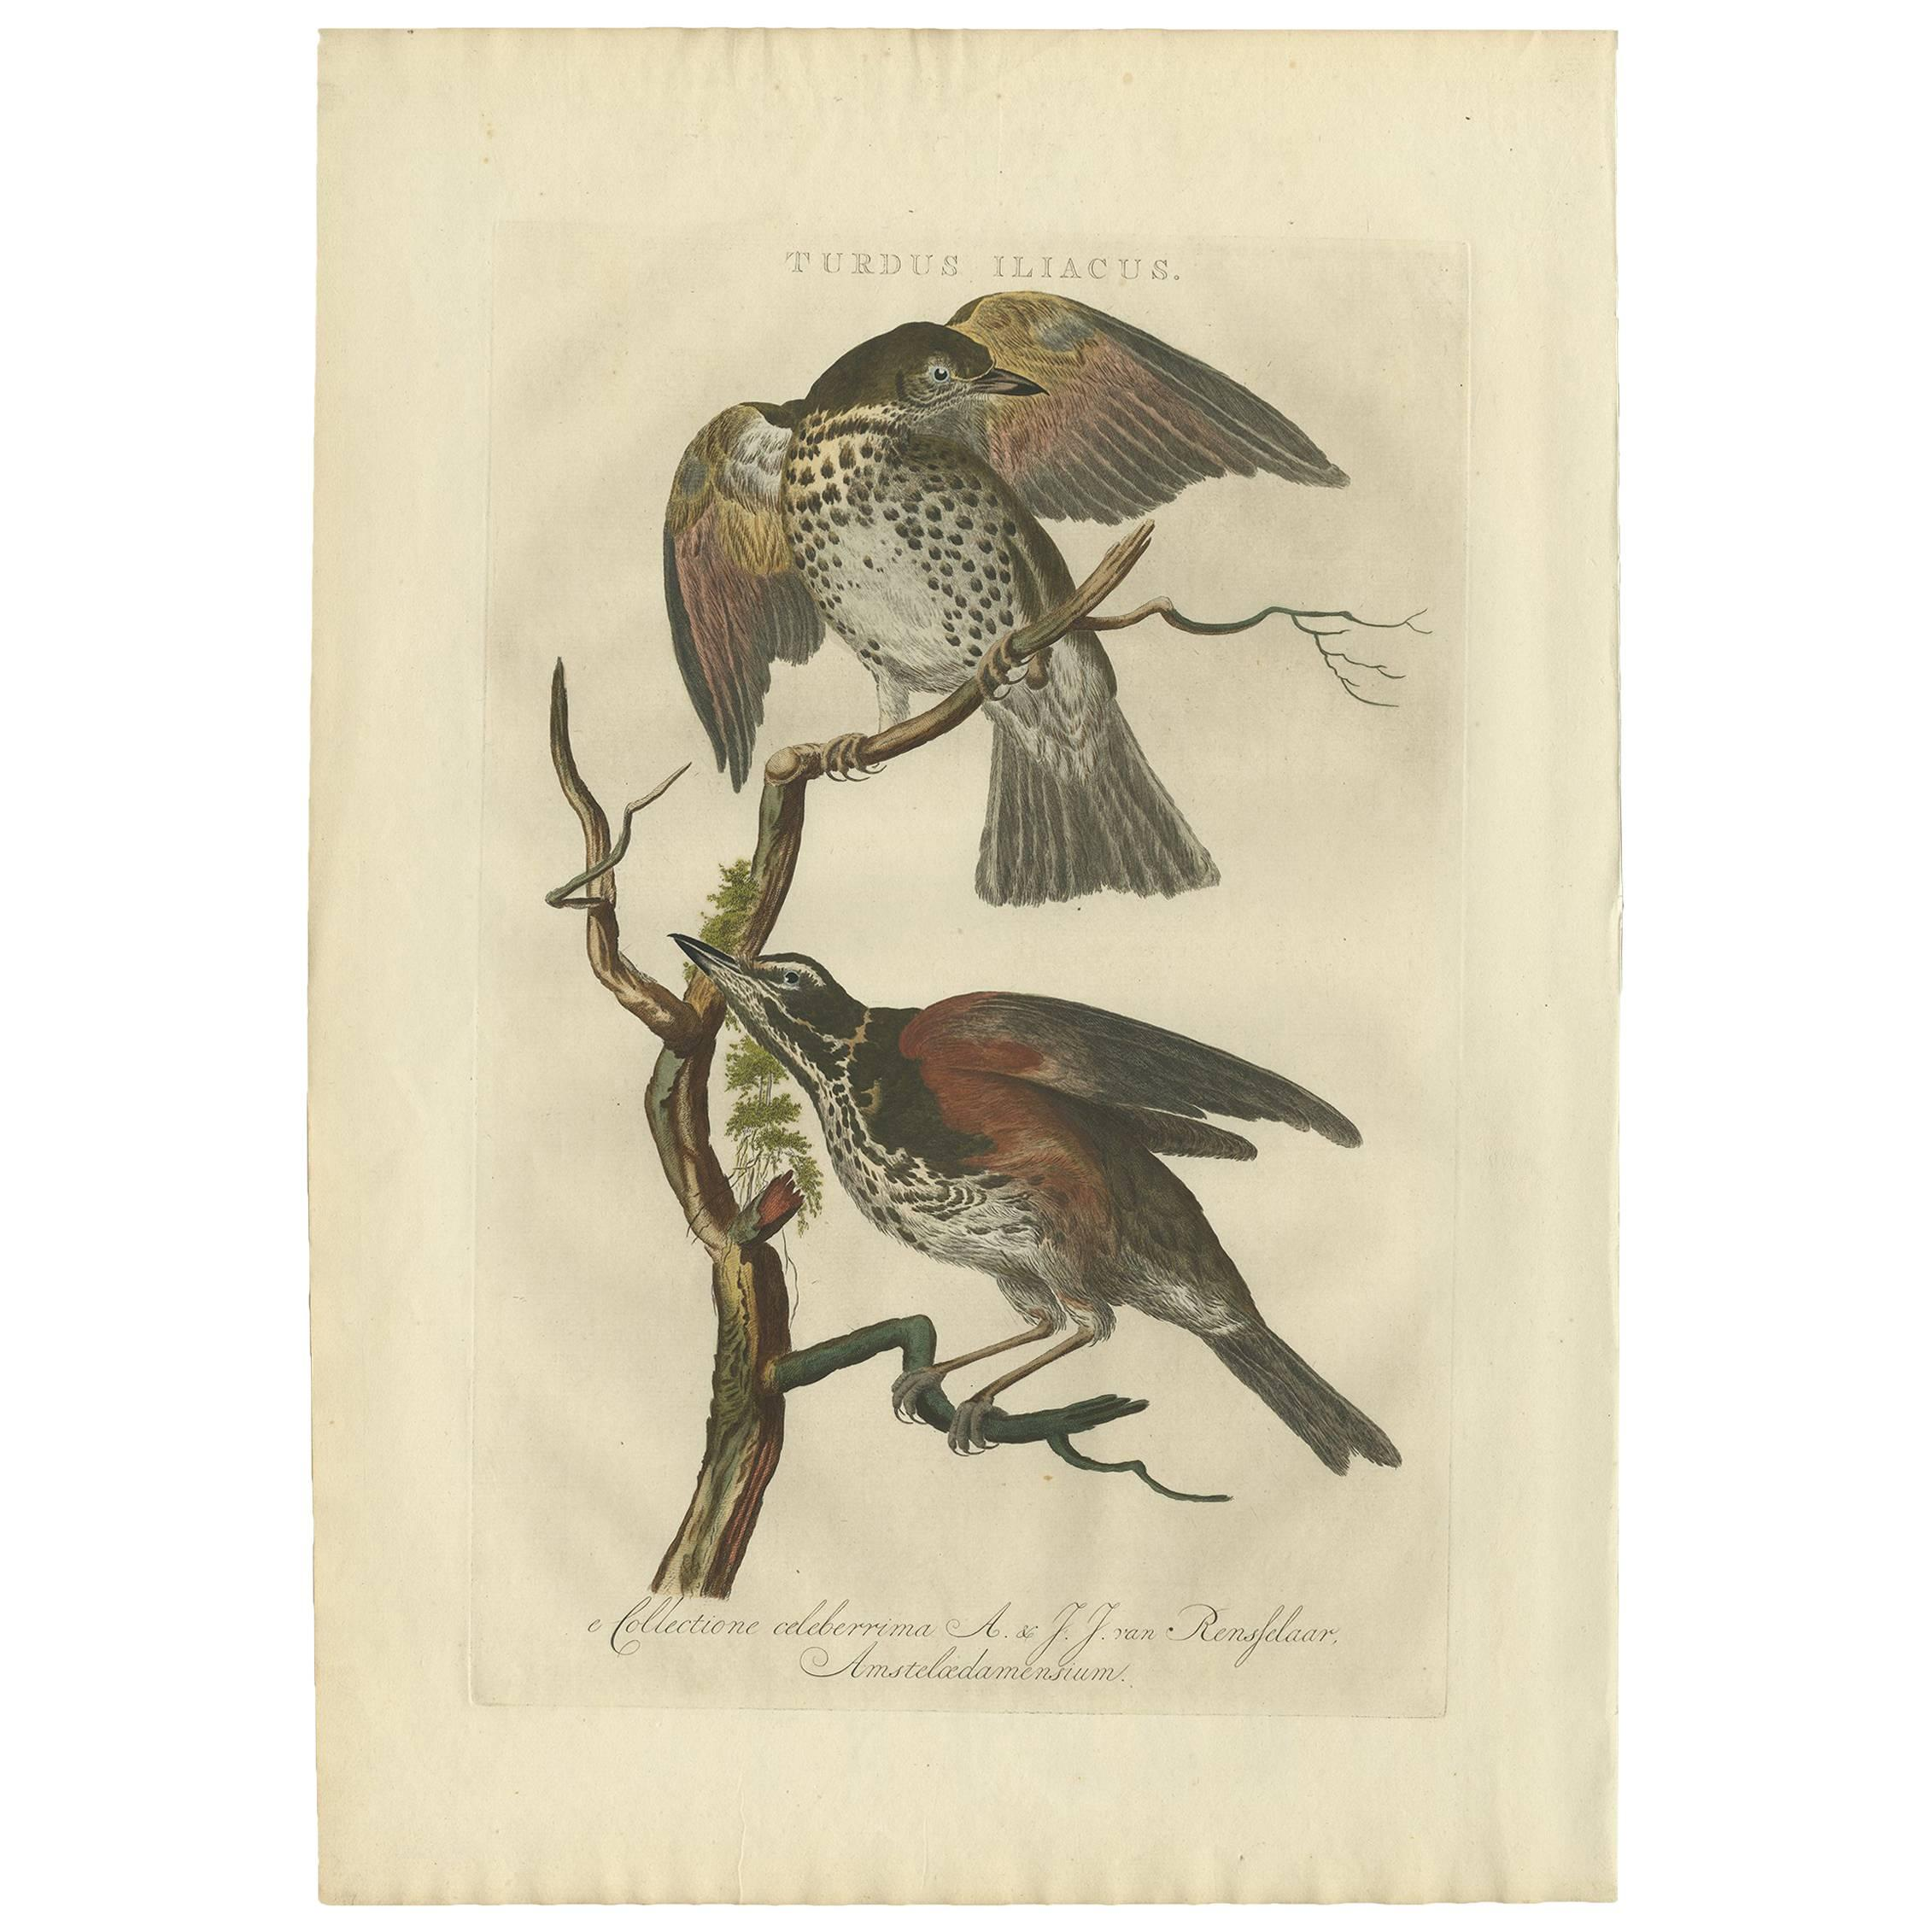 Antique Print of the Redwing Bird by Sepp & Nozeman, 1770